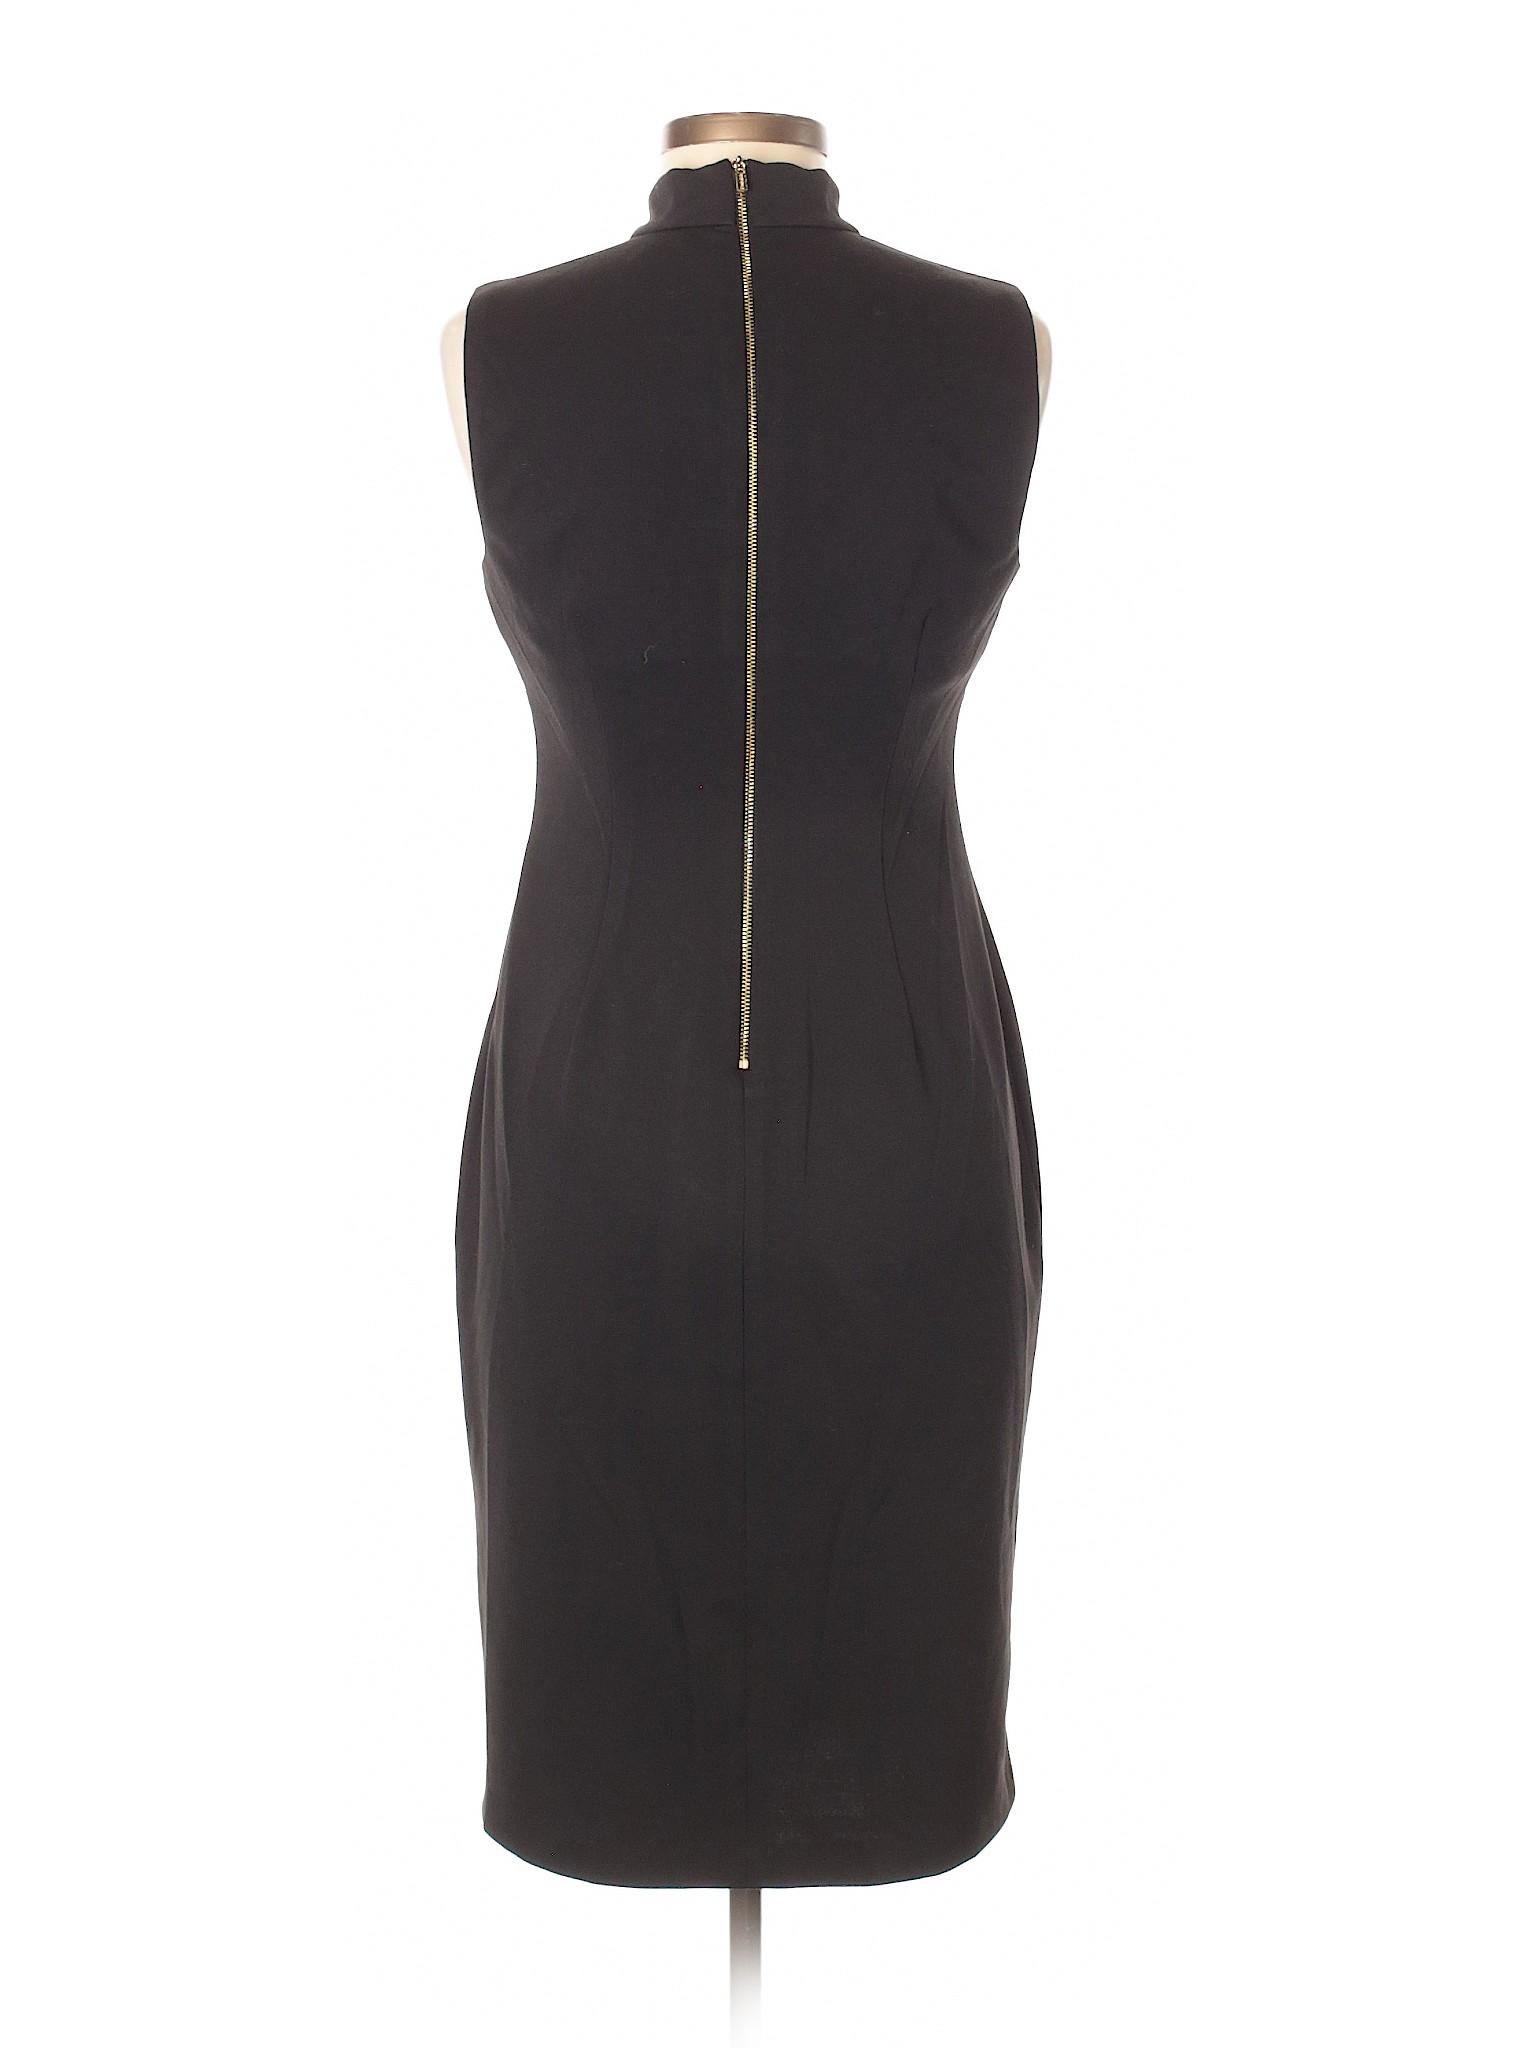 Boutique Calvin Dress Casual winter Klein qY6Yzwg